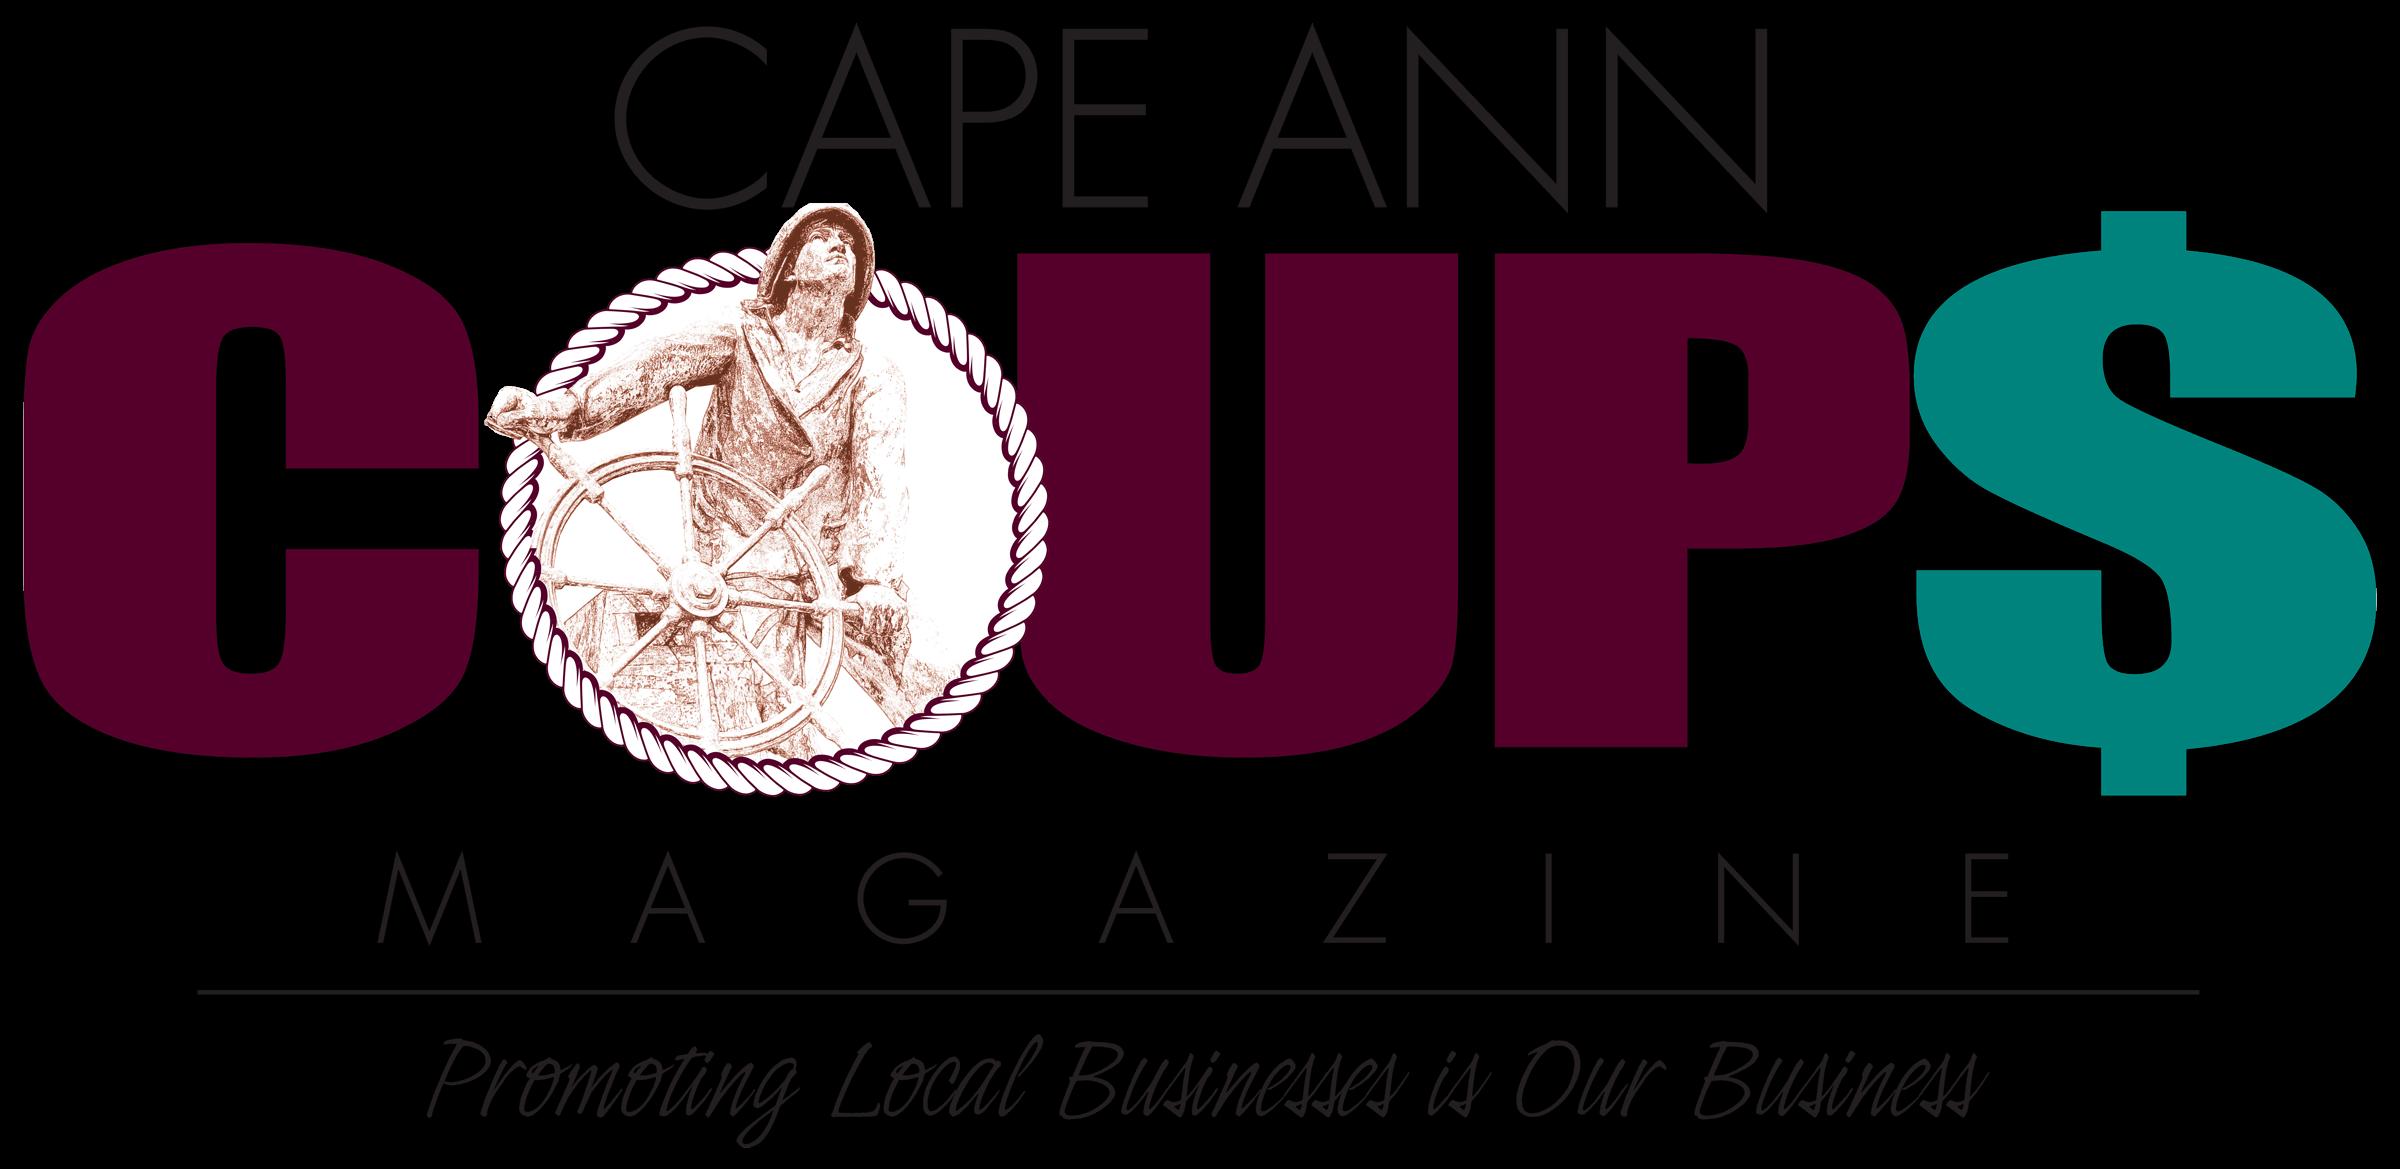 Cape Ann Coups Magazine Logo